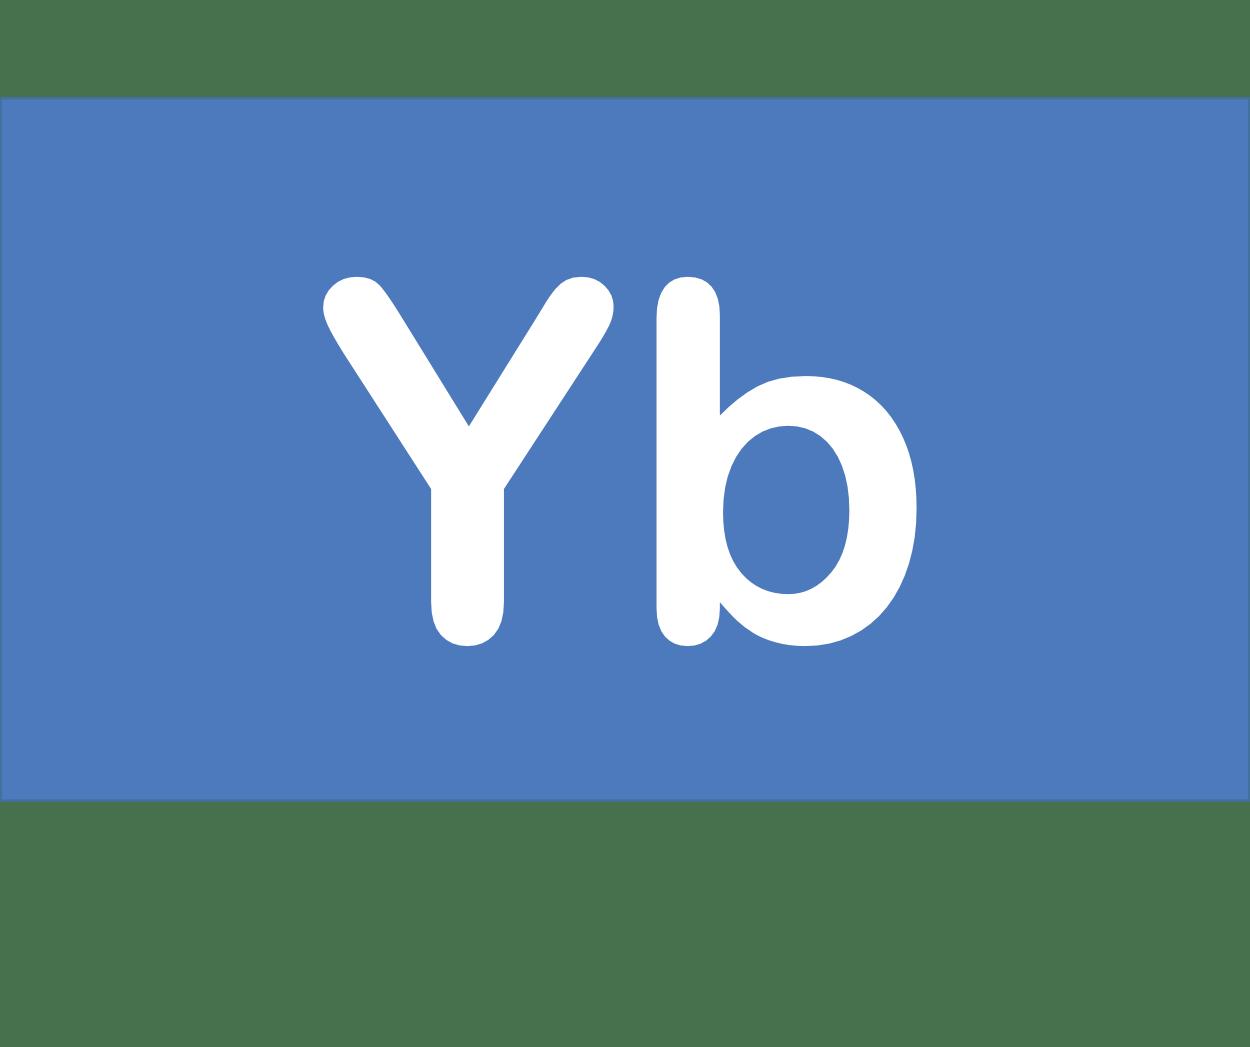 70 Yb イッテルビウム Ytterbium 元素 記号 周期表 化学 原子